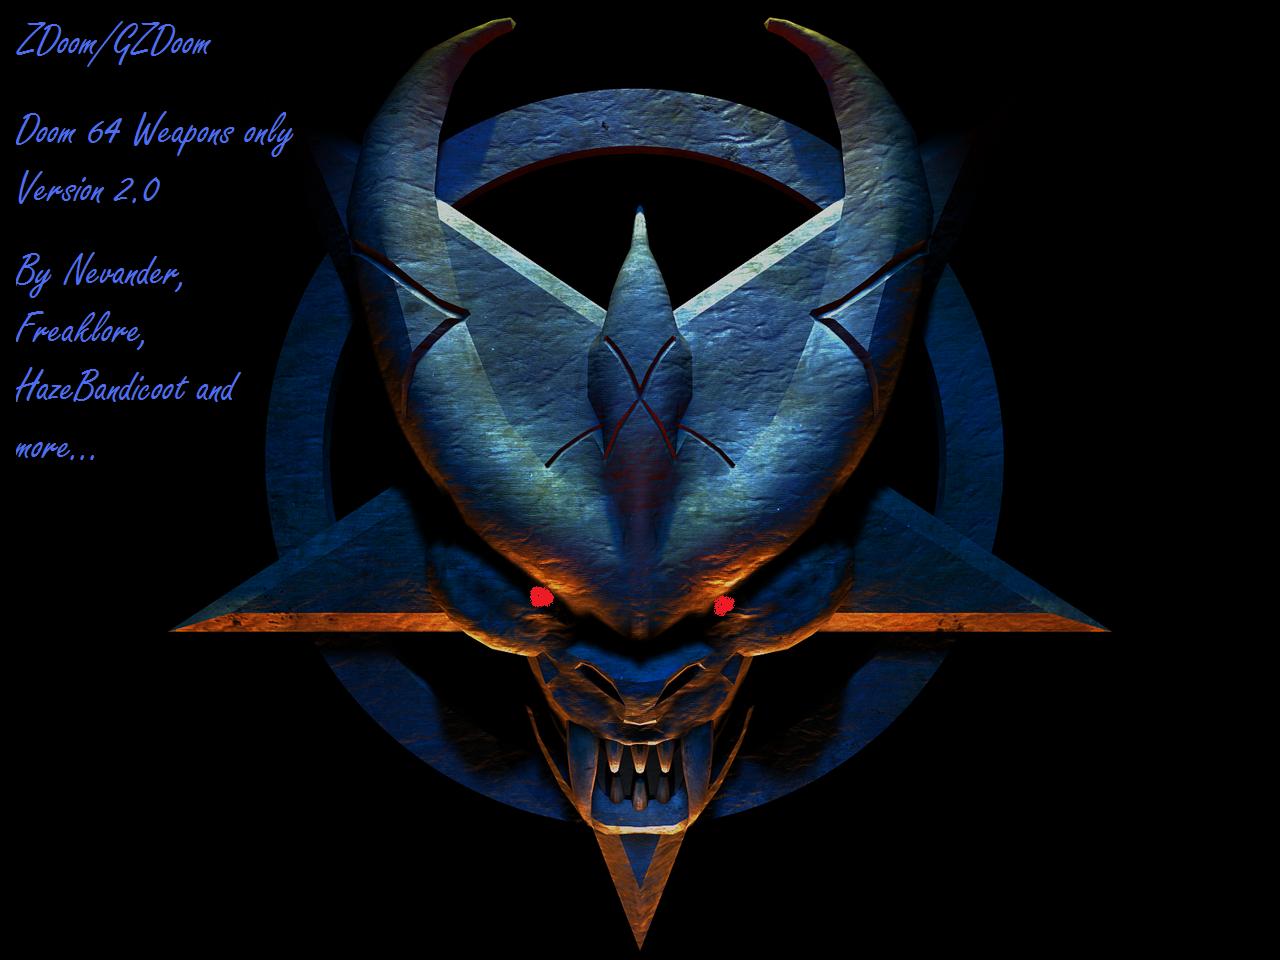 Doom 64 weapons only Version 2.0 (ZDoom/GZDoom) addon - Mod DB